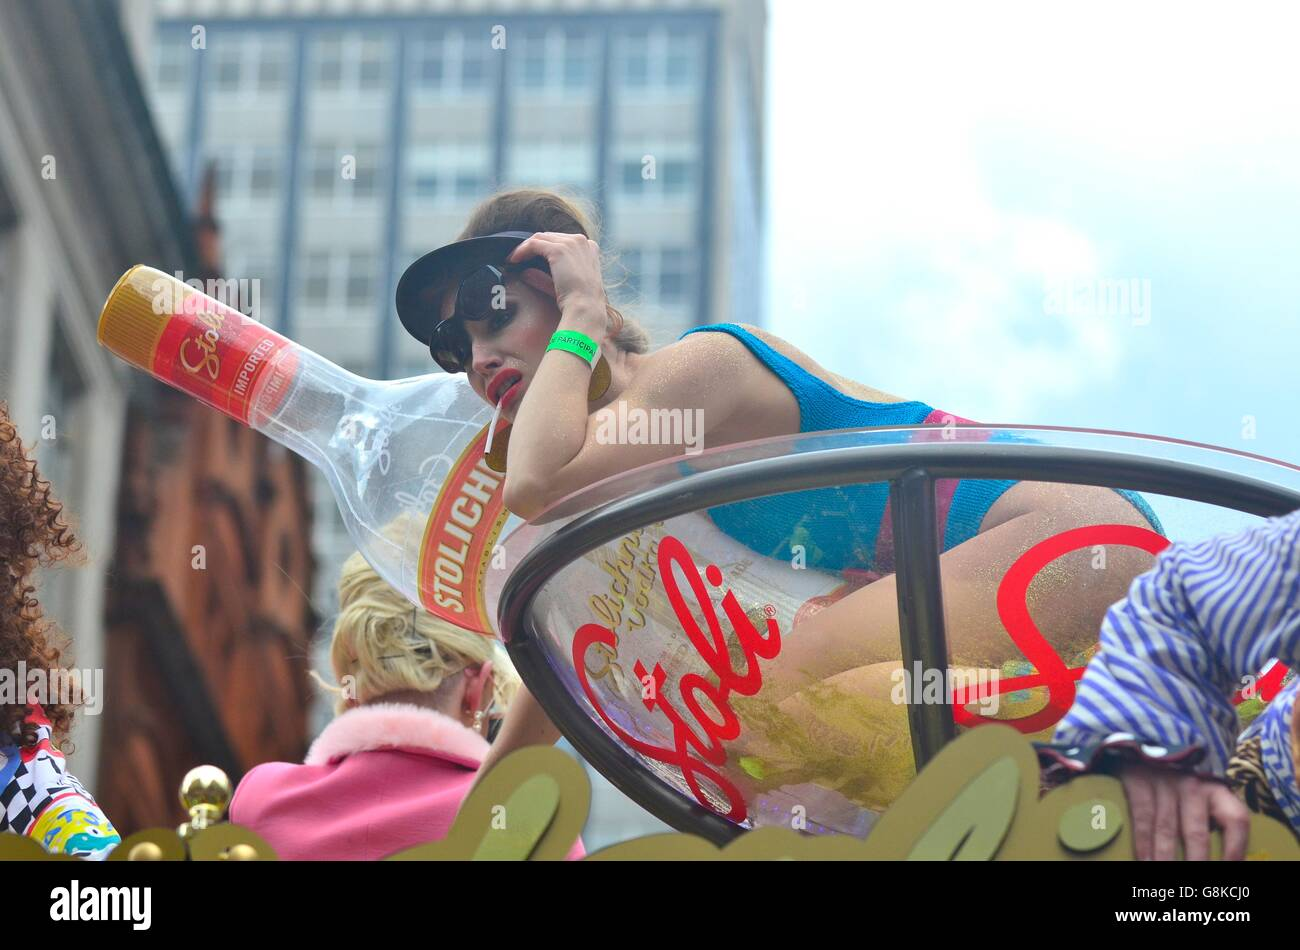 Gay Pride Parade 2016, London, England, UK - Stock Image